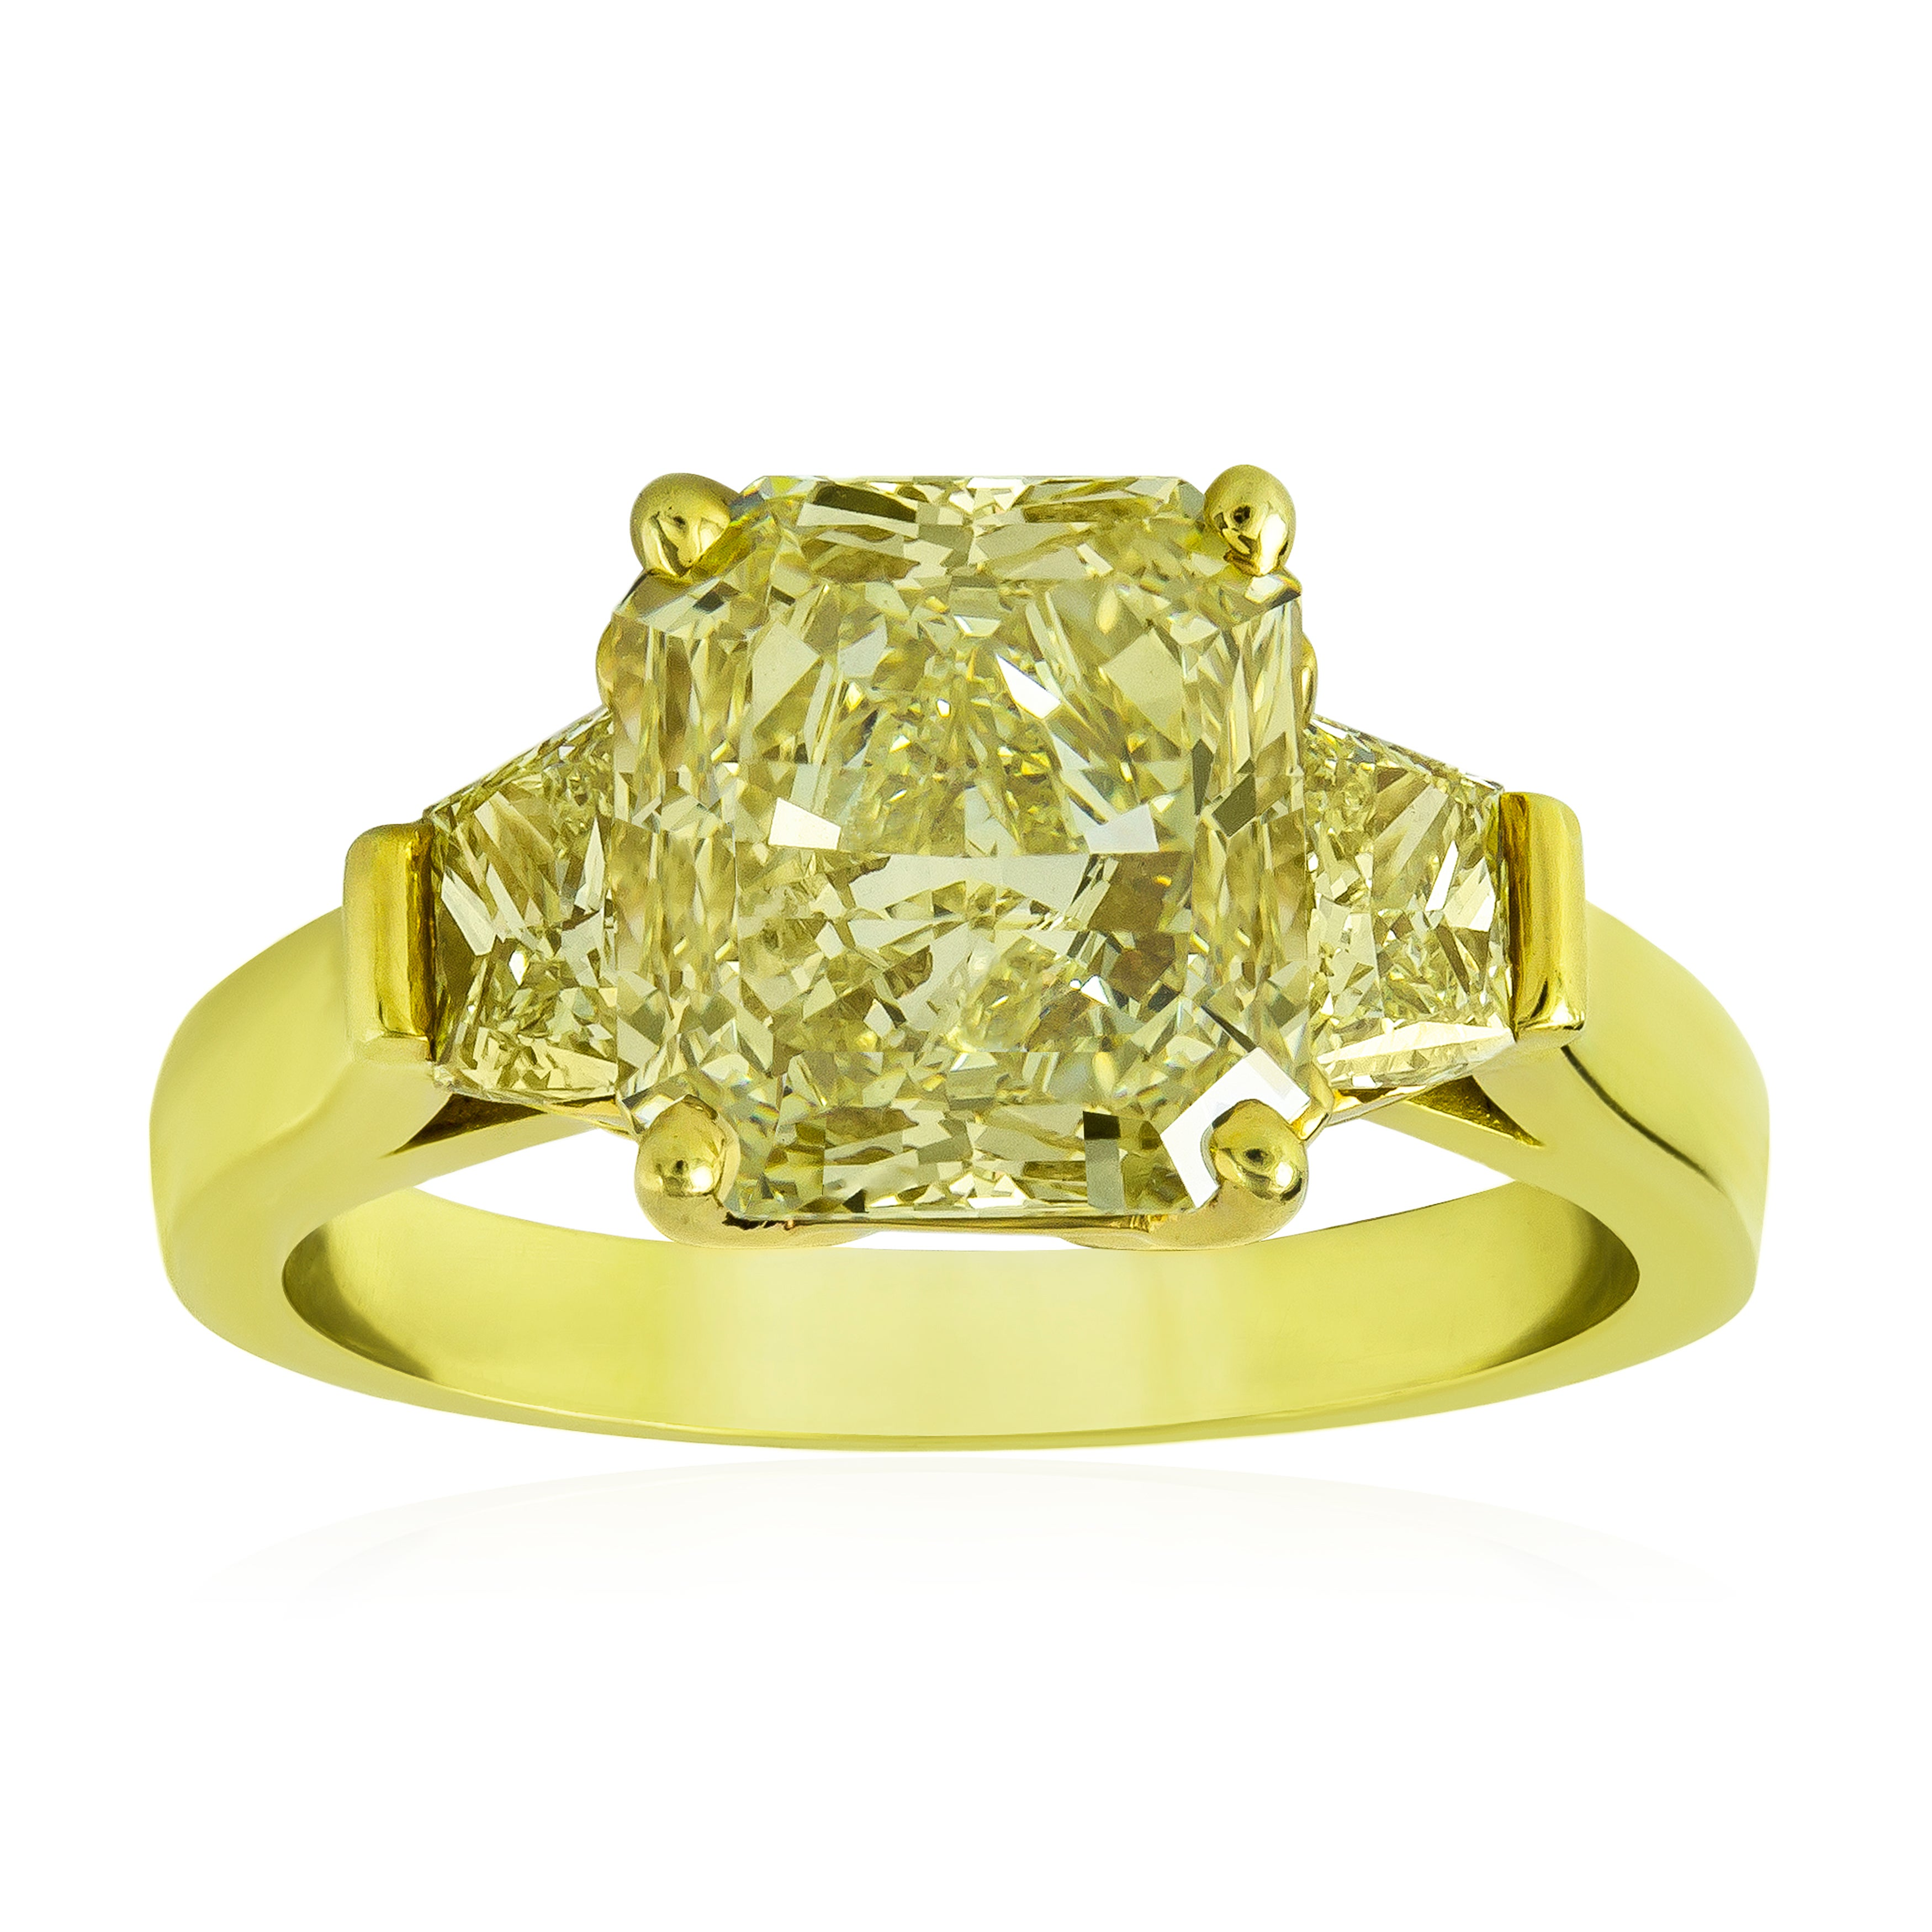 Roman Malakov, Radiant Cut Yellow Diamond Three-Stone Engagement Ring